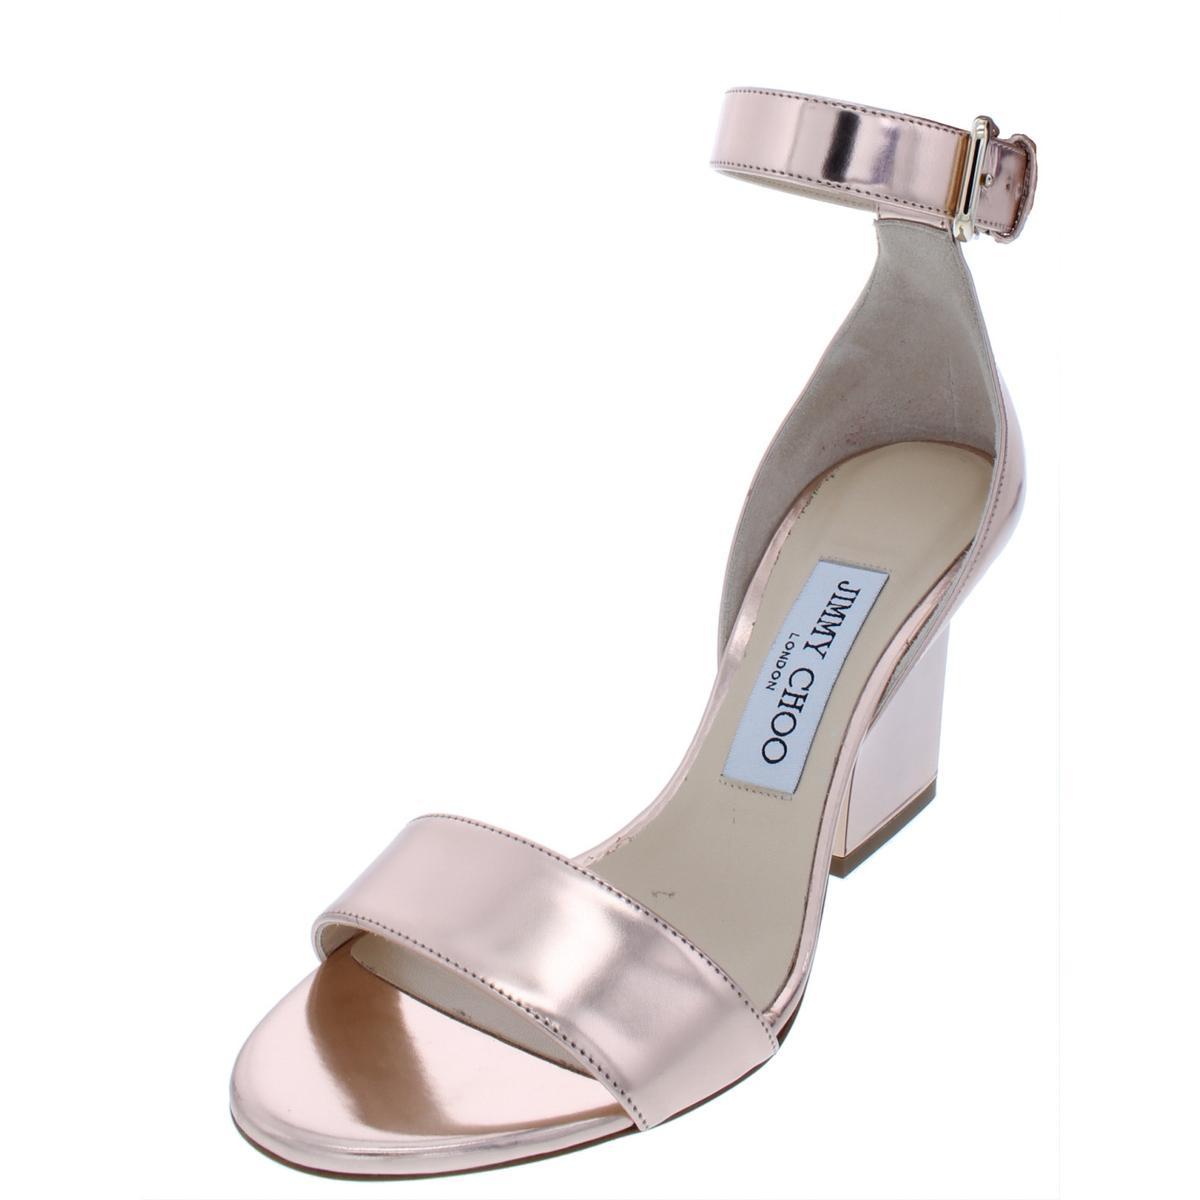 Jimmy m Womens Shoes Choo Dress Mediumb Gold 5 Edina 36 Sandals 0nPk8Ow